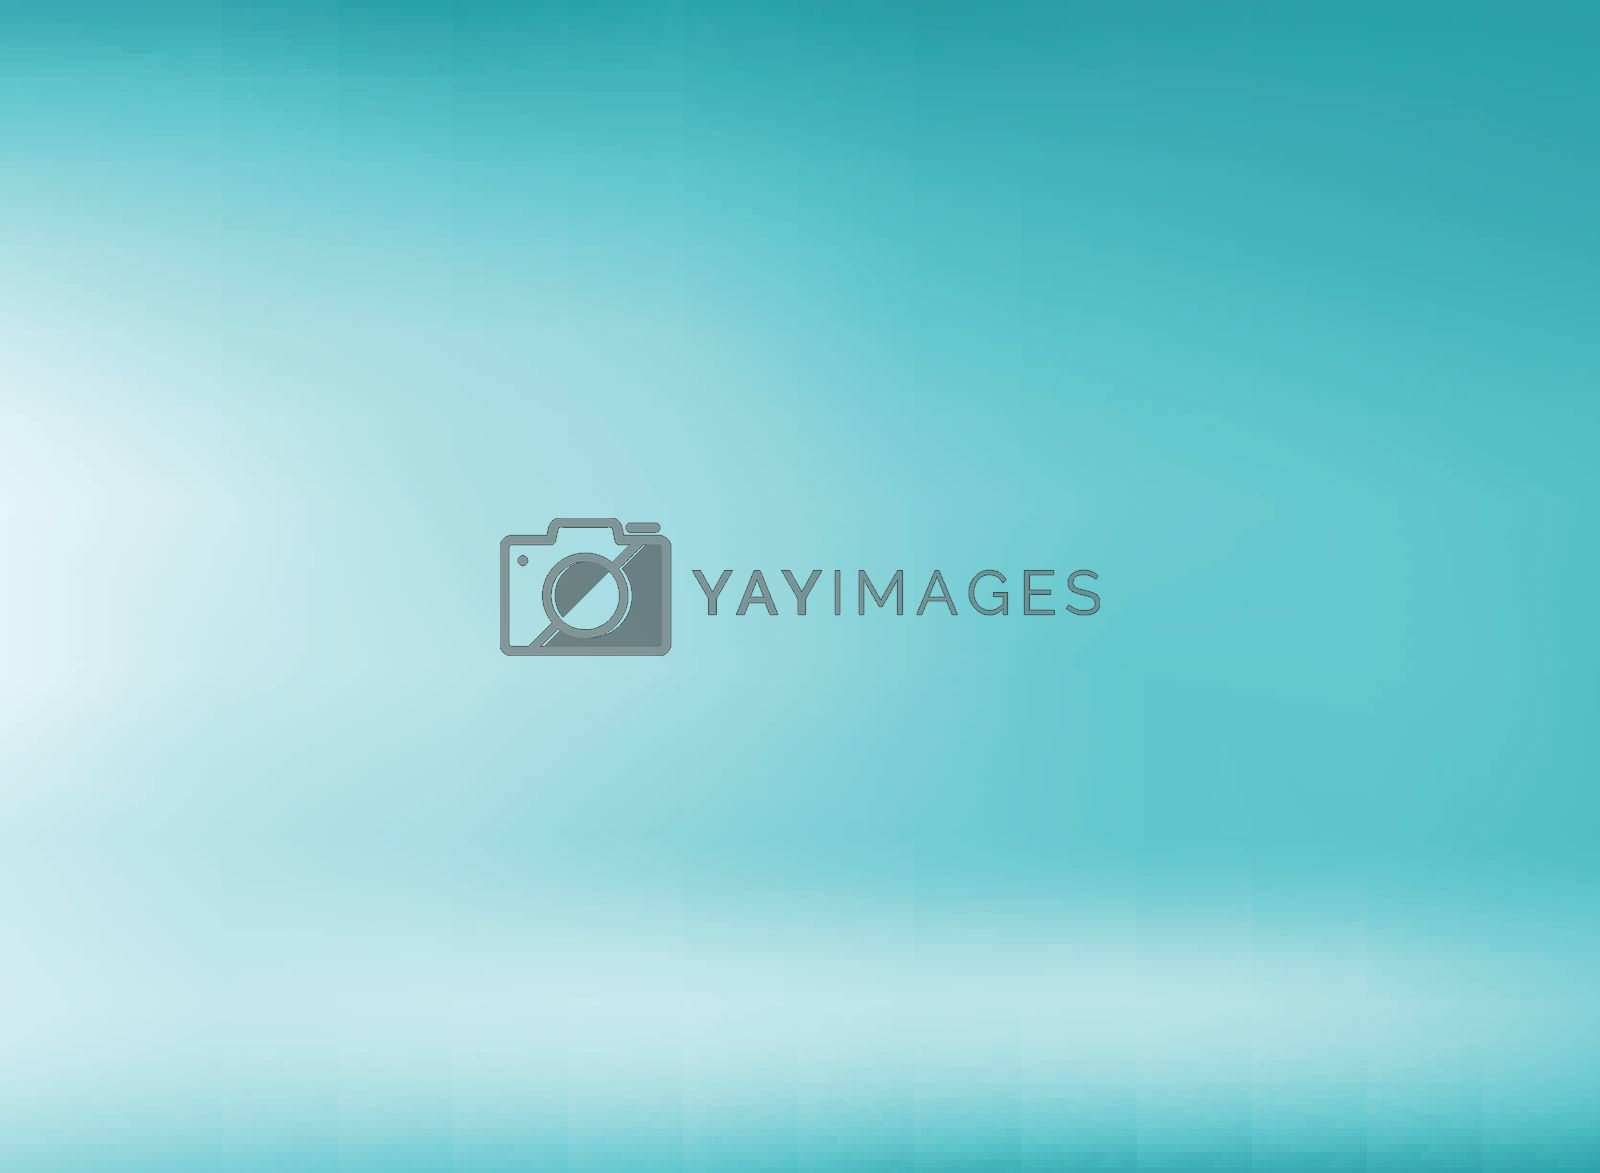 Studio room green mint color background with soft lighting. You can use for design print, brochure, poster, banner, website, Presentation. Vector illustration